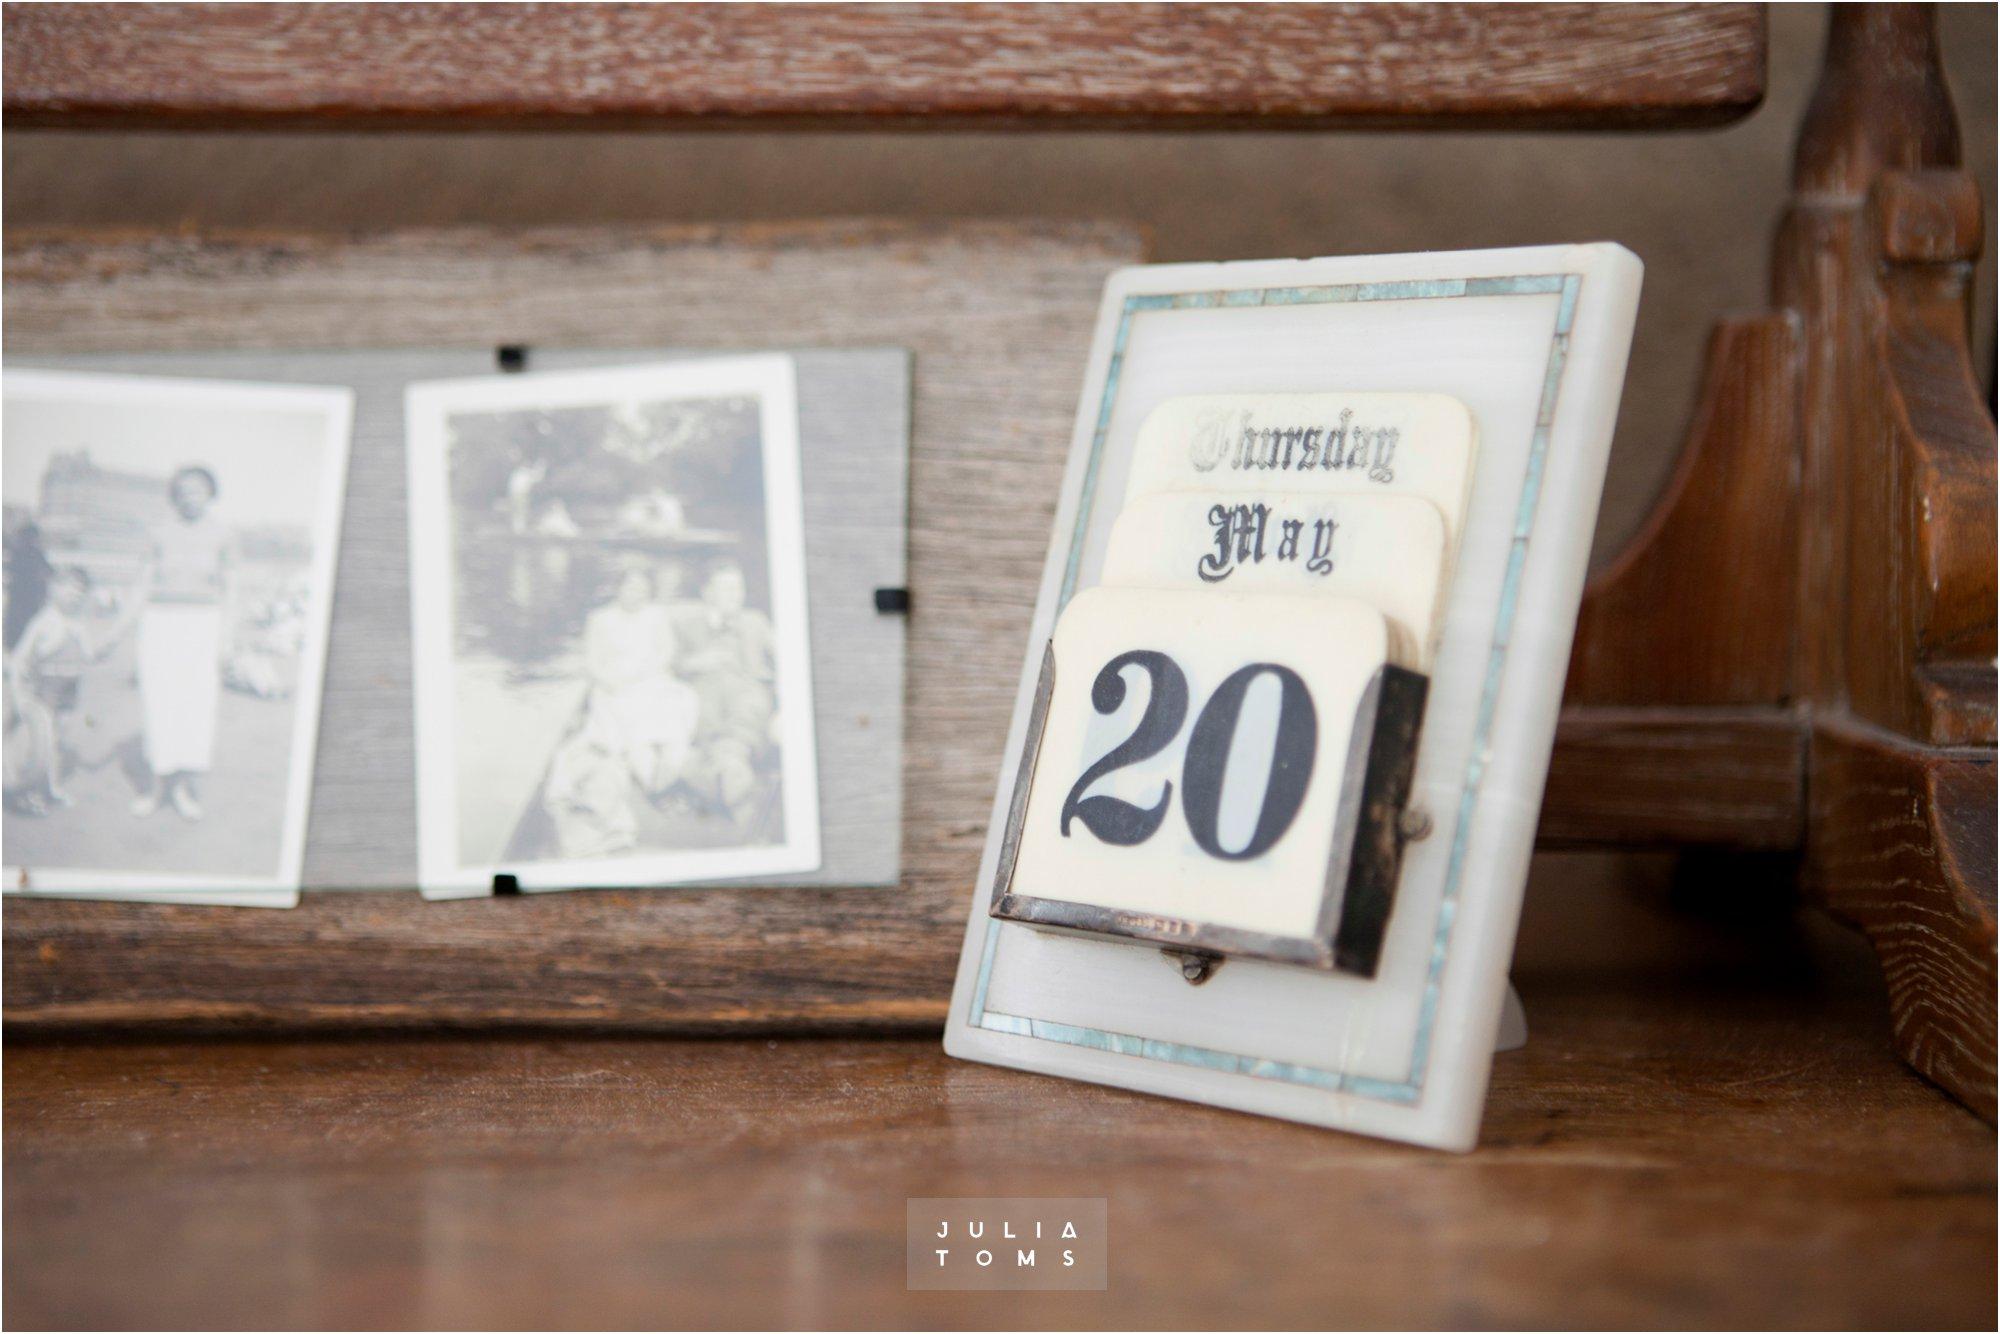 julia_toms_photography_interiors_magazine_011.jpg